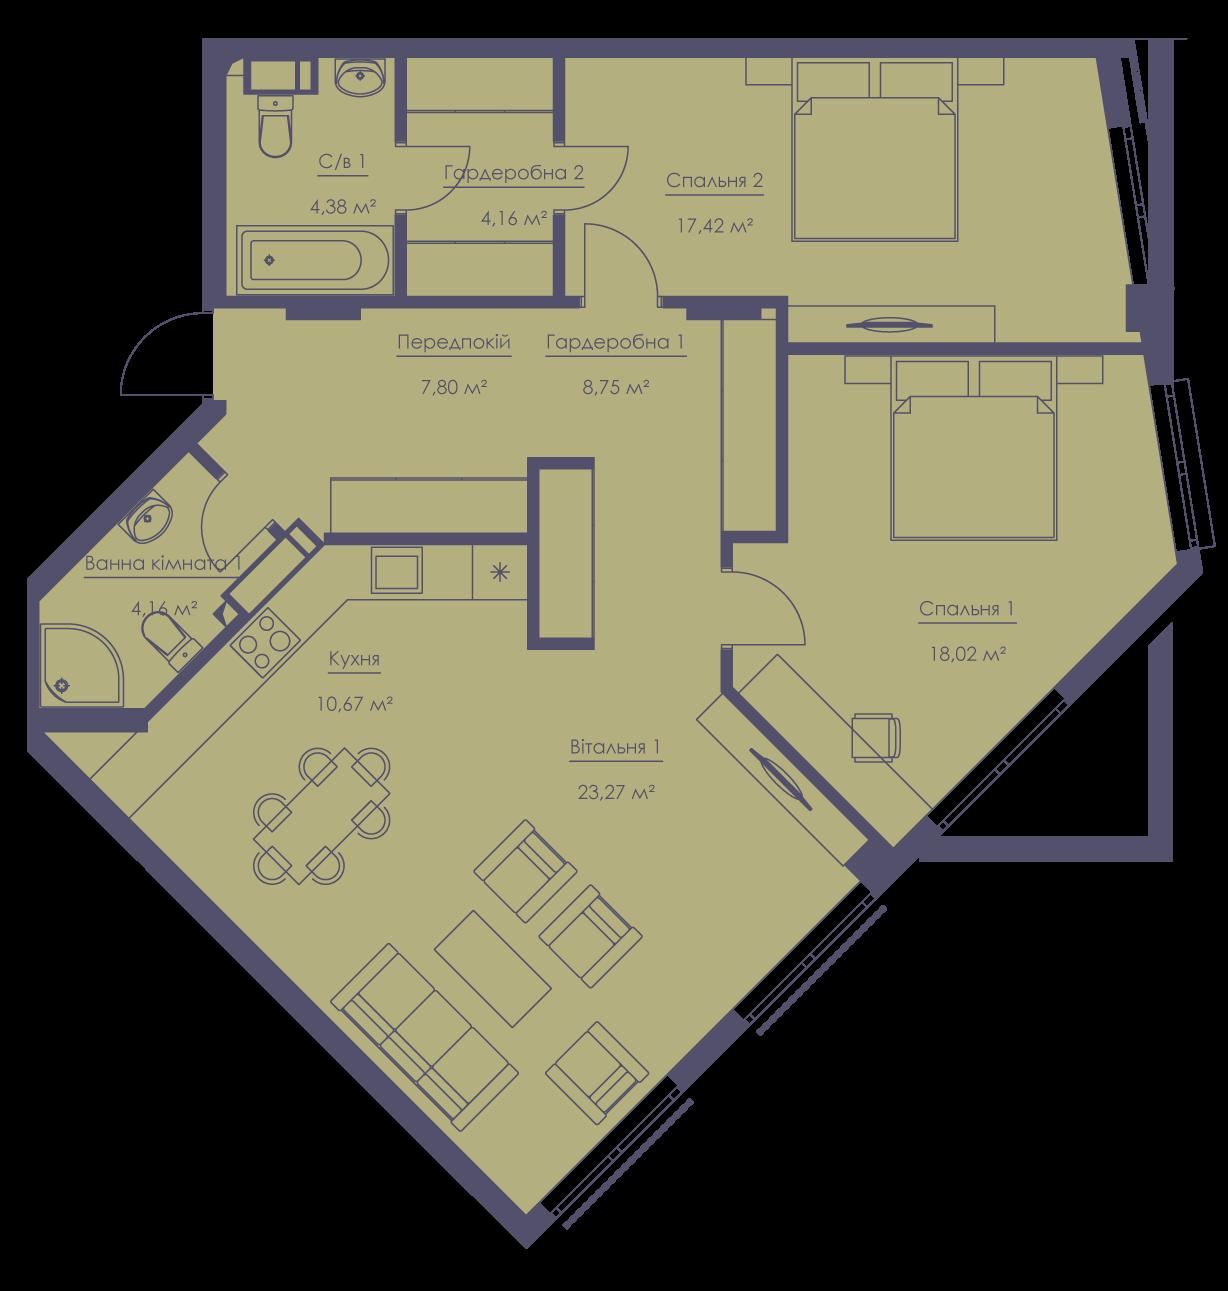 Apartment layout KV_48_3a_1_1_12-1